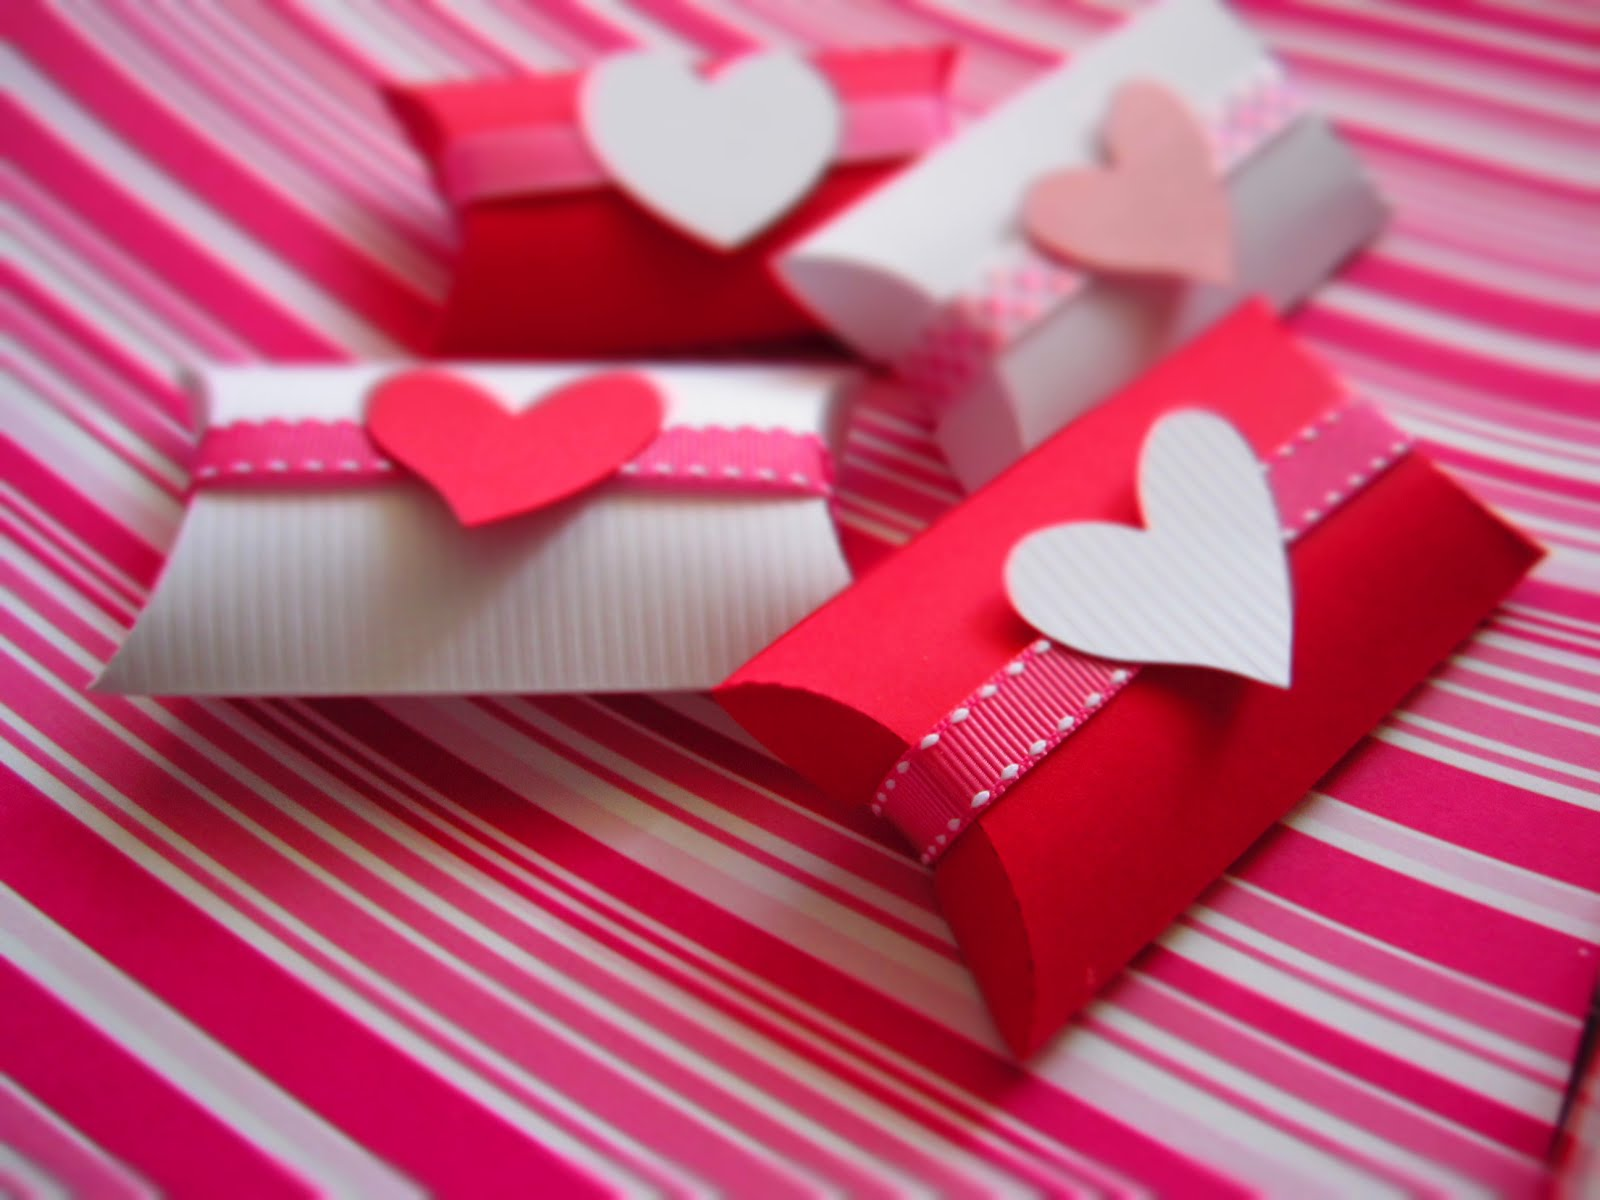 Allegro detalles que festejan amor y amistad for Detalles de manualidades